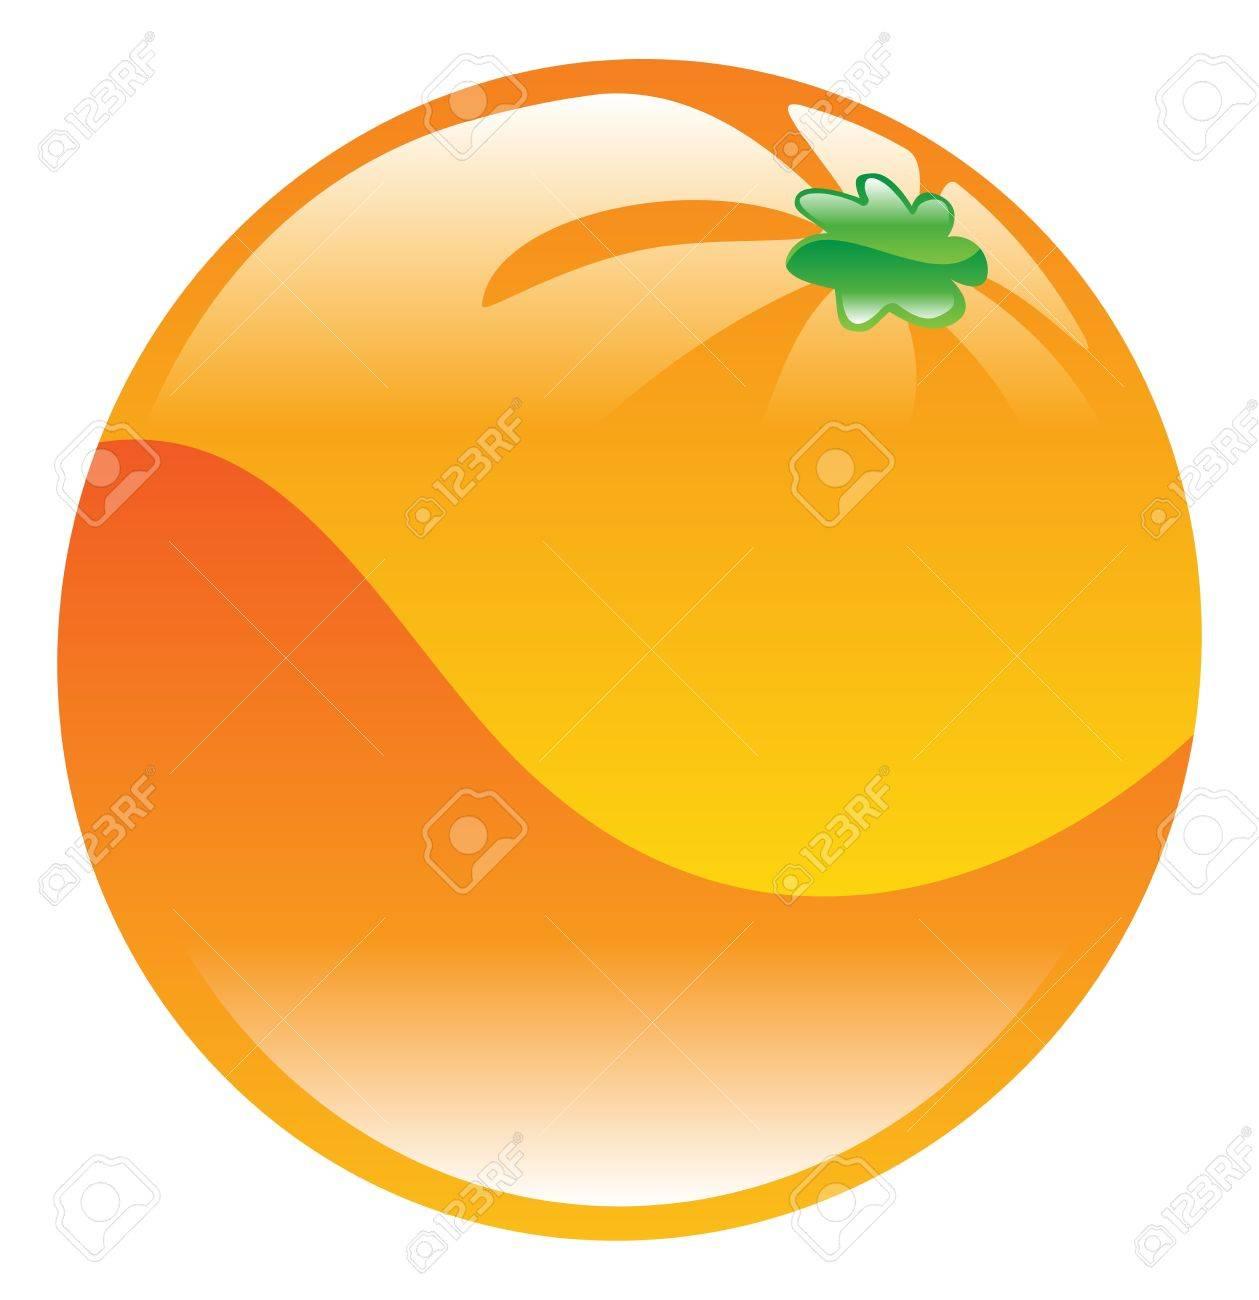 Naranja clipart picture royalty free Naranja clipart 4 » Clipart Station picture royalty free